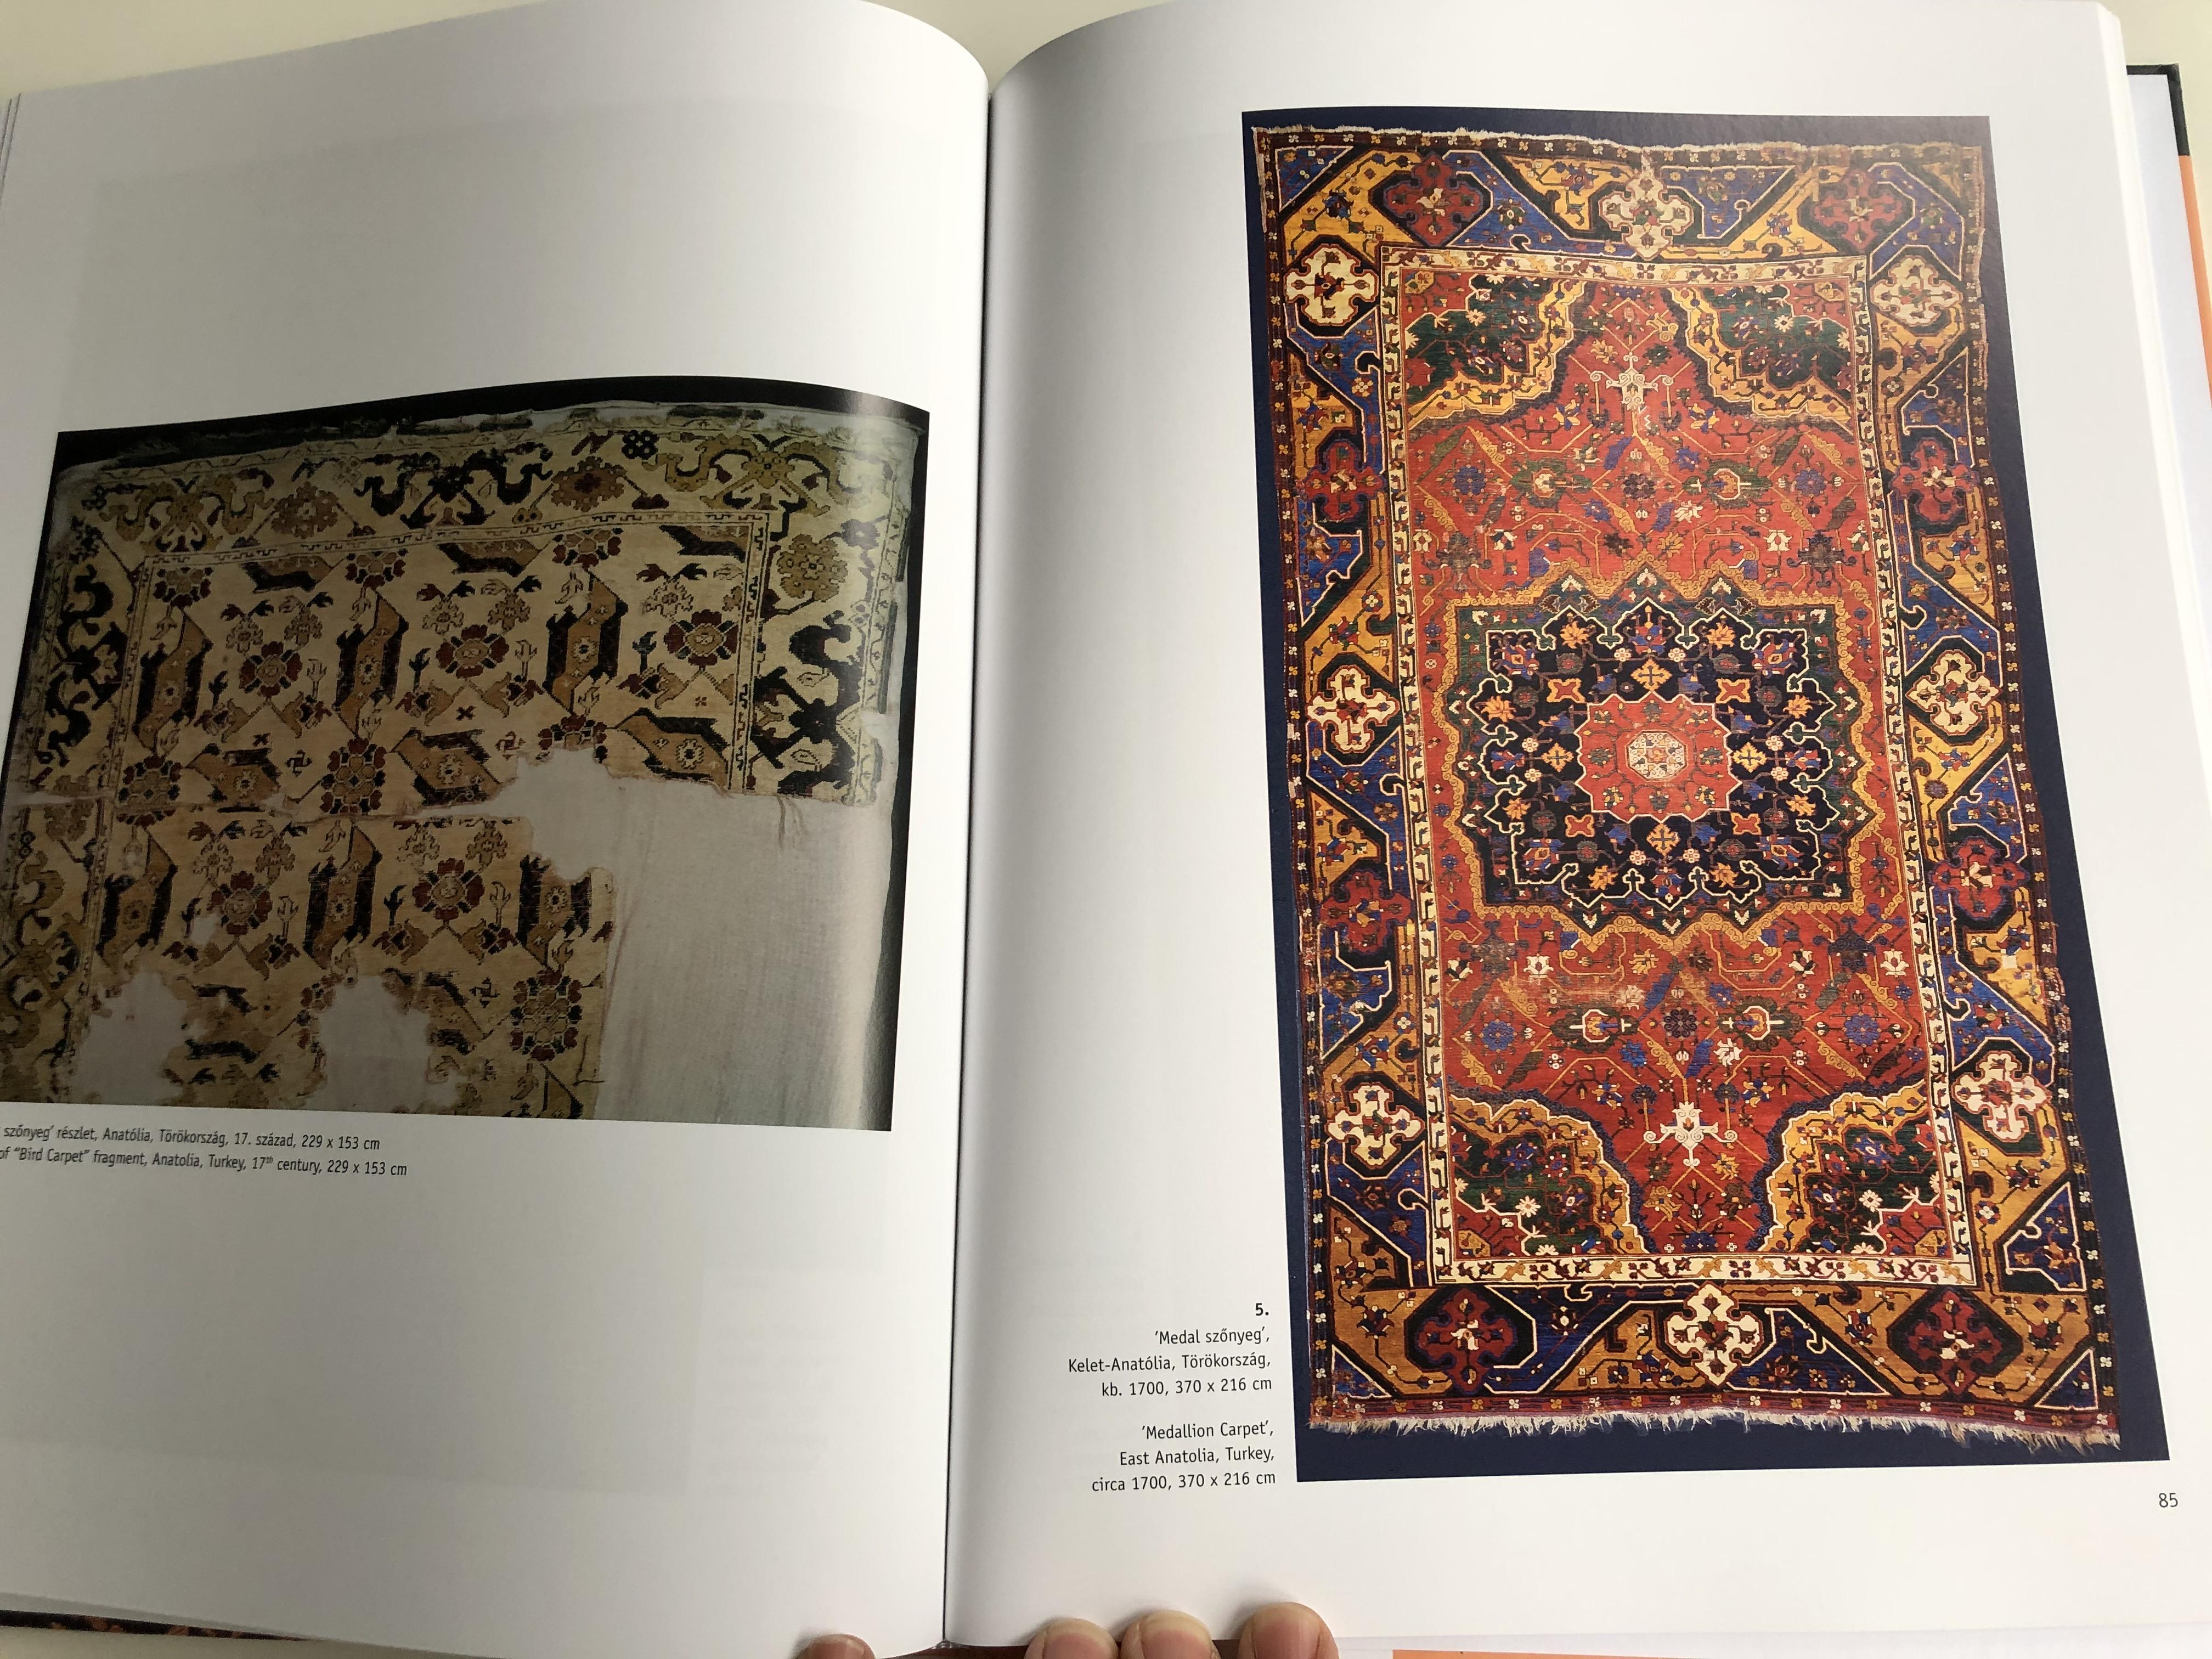 islamic-art-iszl-m-m-v-szet-by-martin-j-zsef-a-manor-house-ban-15.jpg